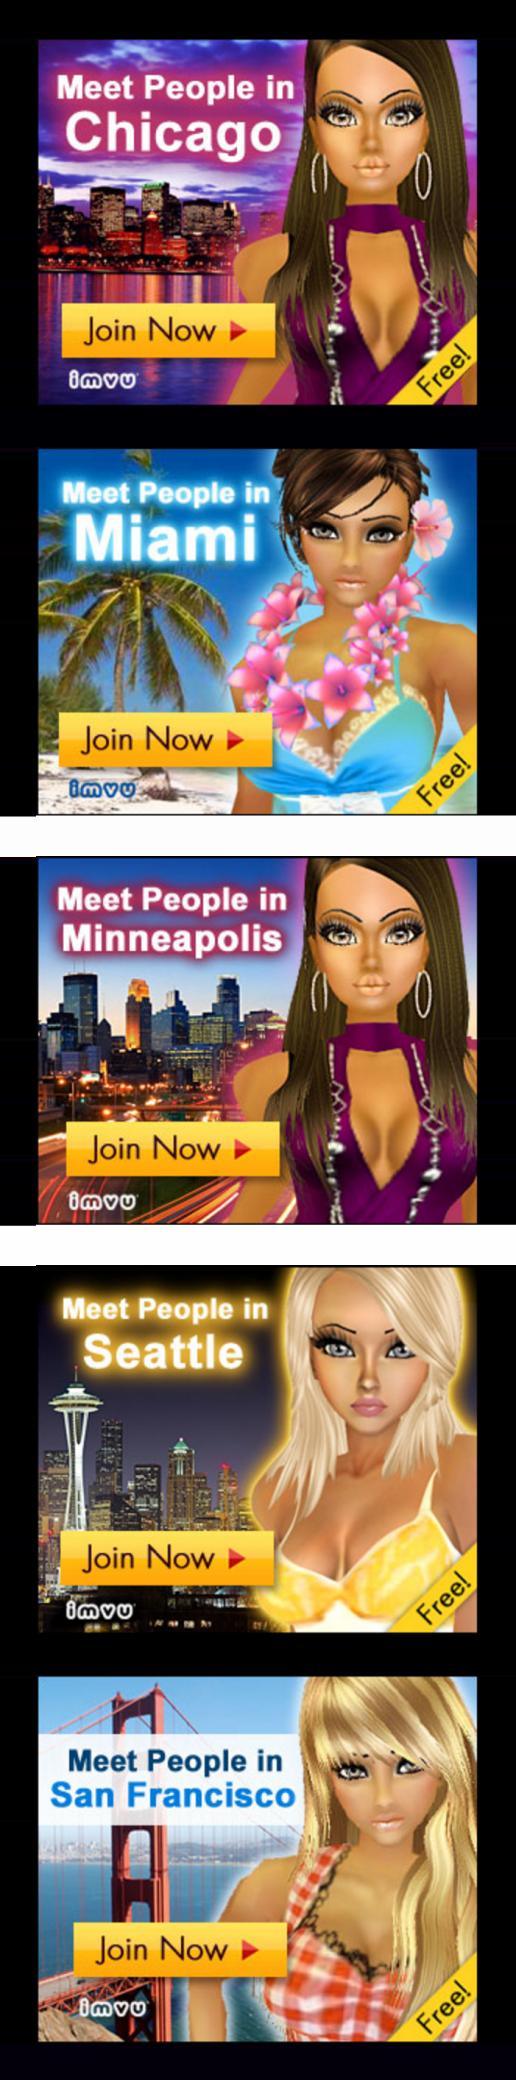 imvu-geo-targeted-city-banner-ads